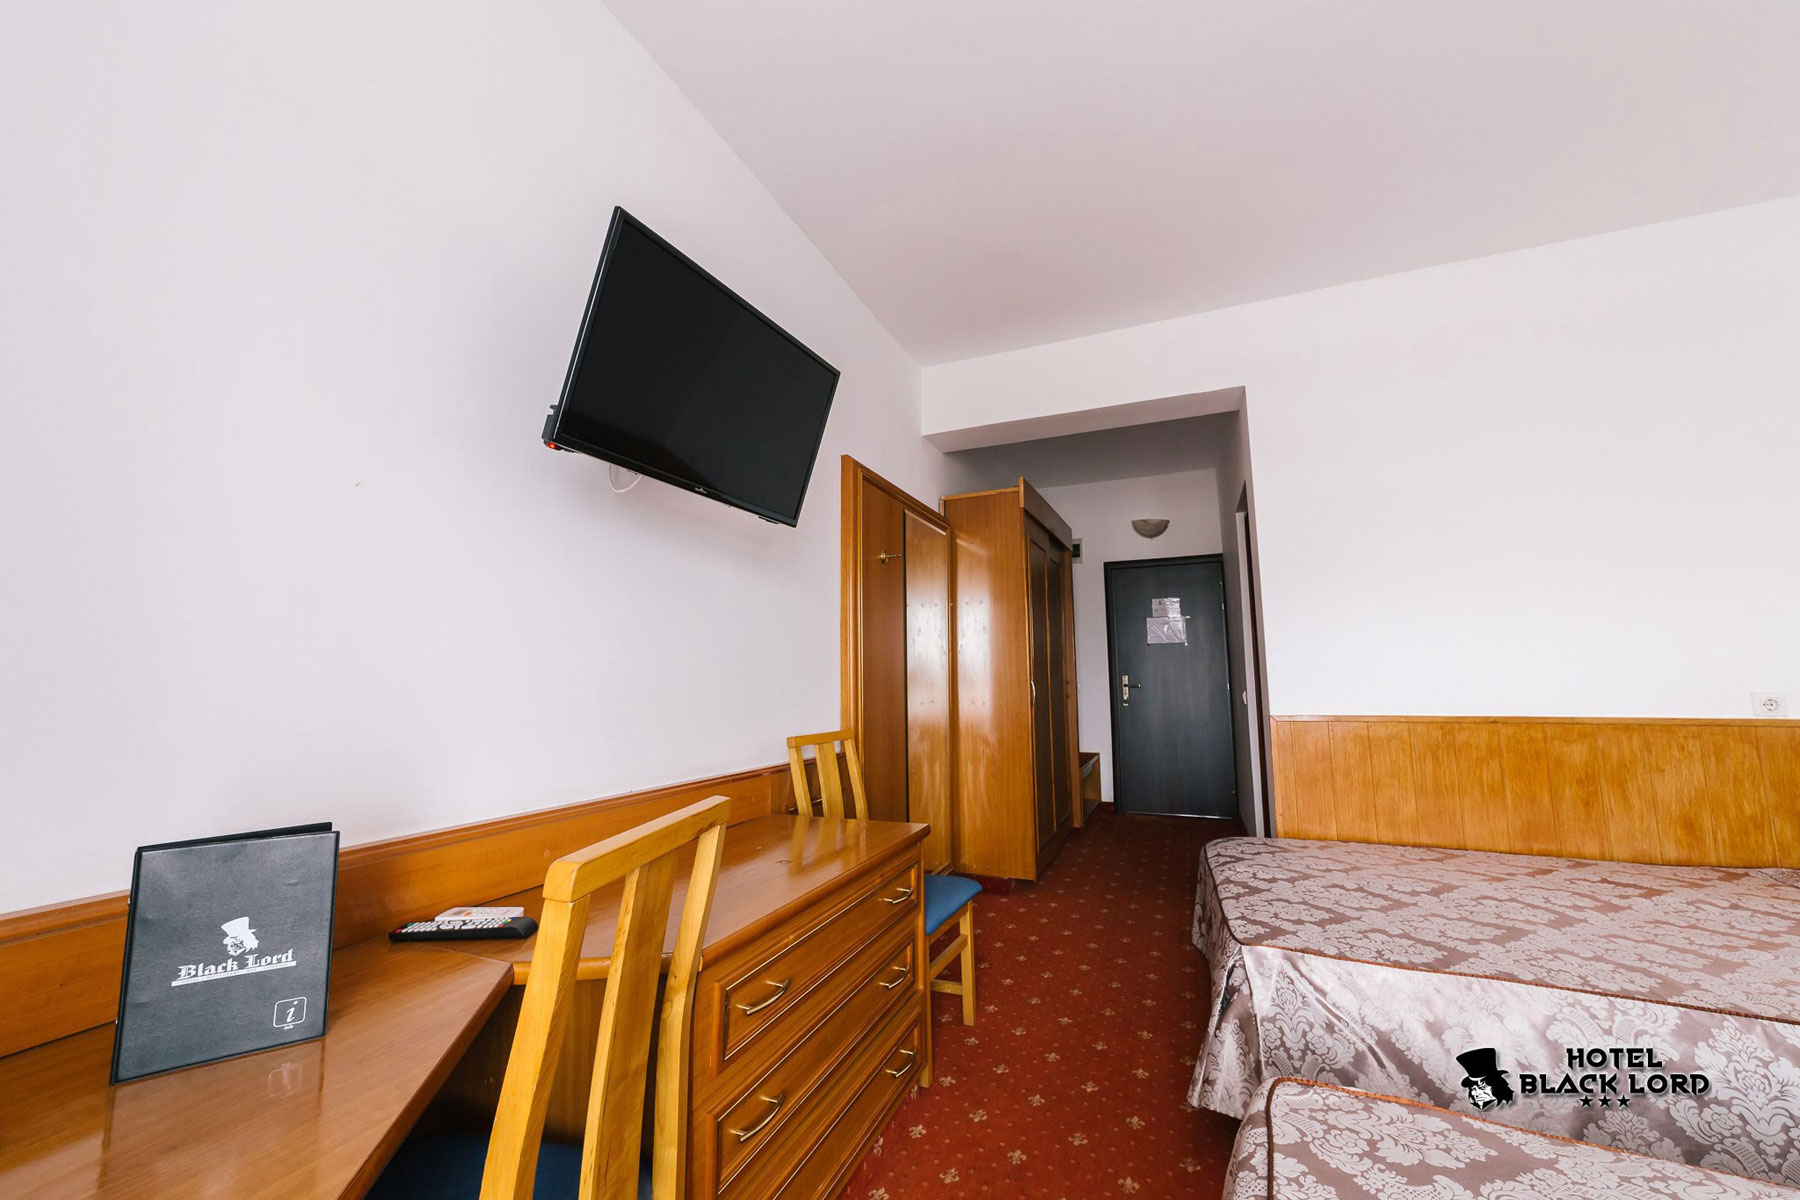 hotel black lord